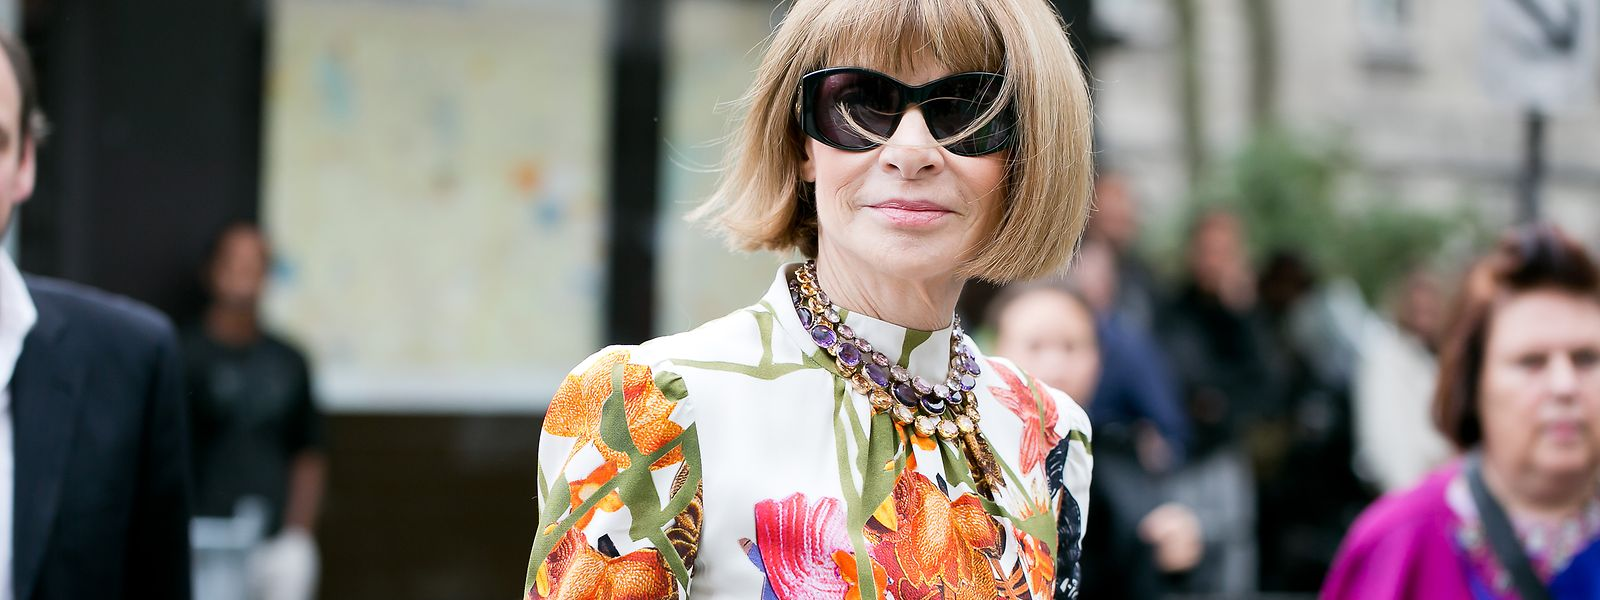 Si même Anna Wintour adopte des principes de recyclage dans sa garde-robe...